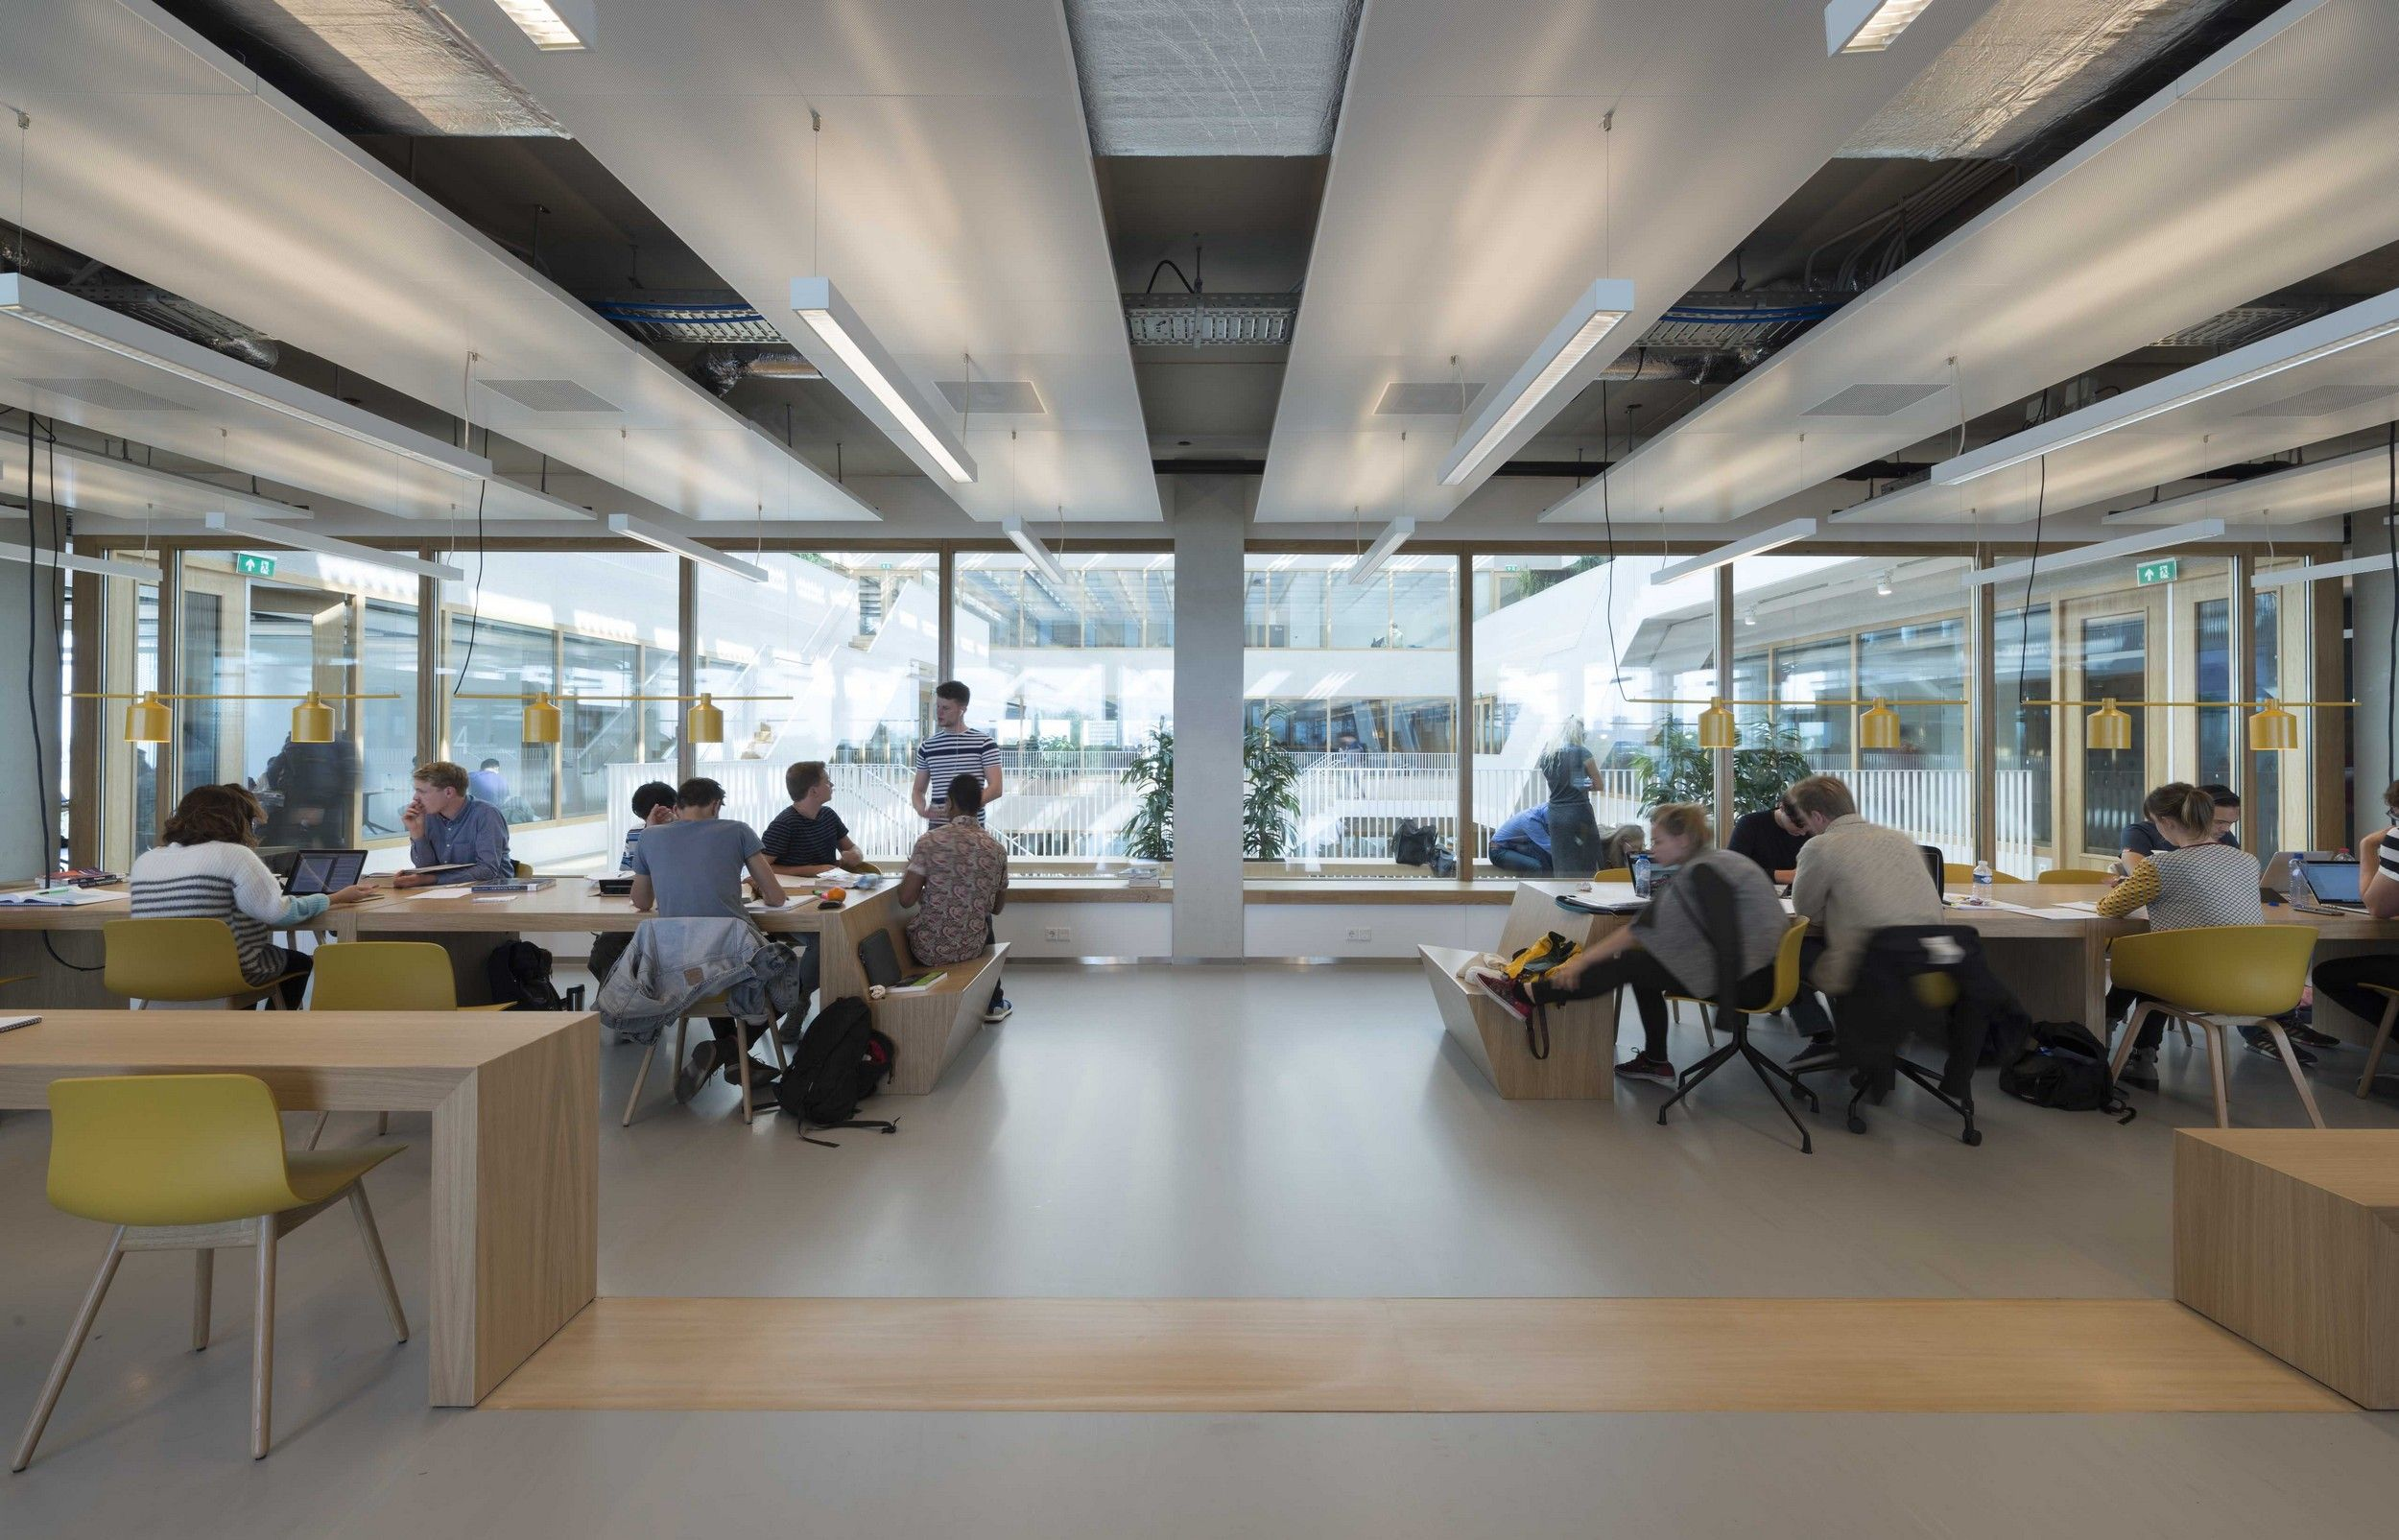 Polak building - Erasmus University Rotterdam